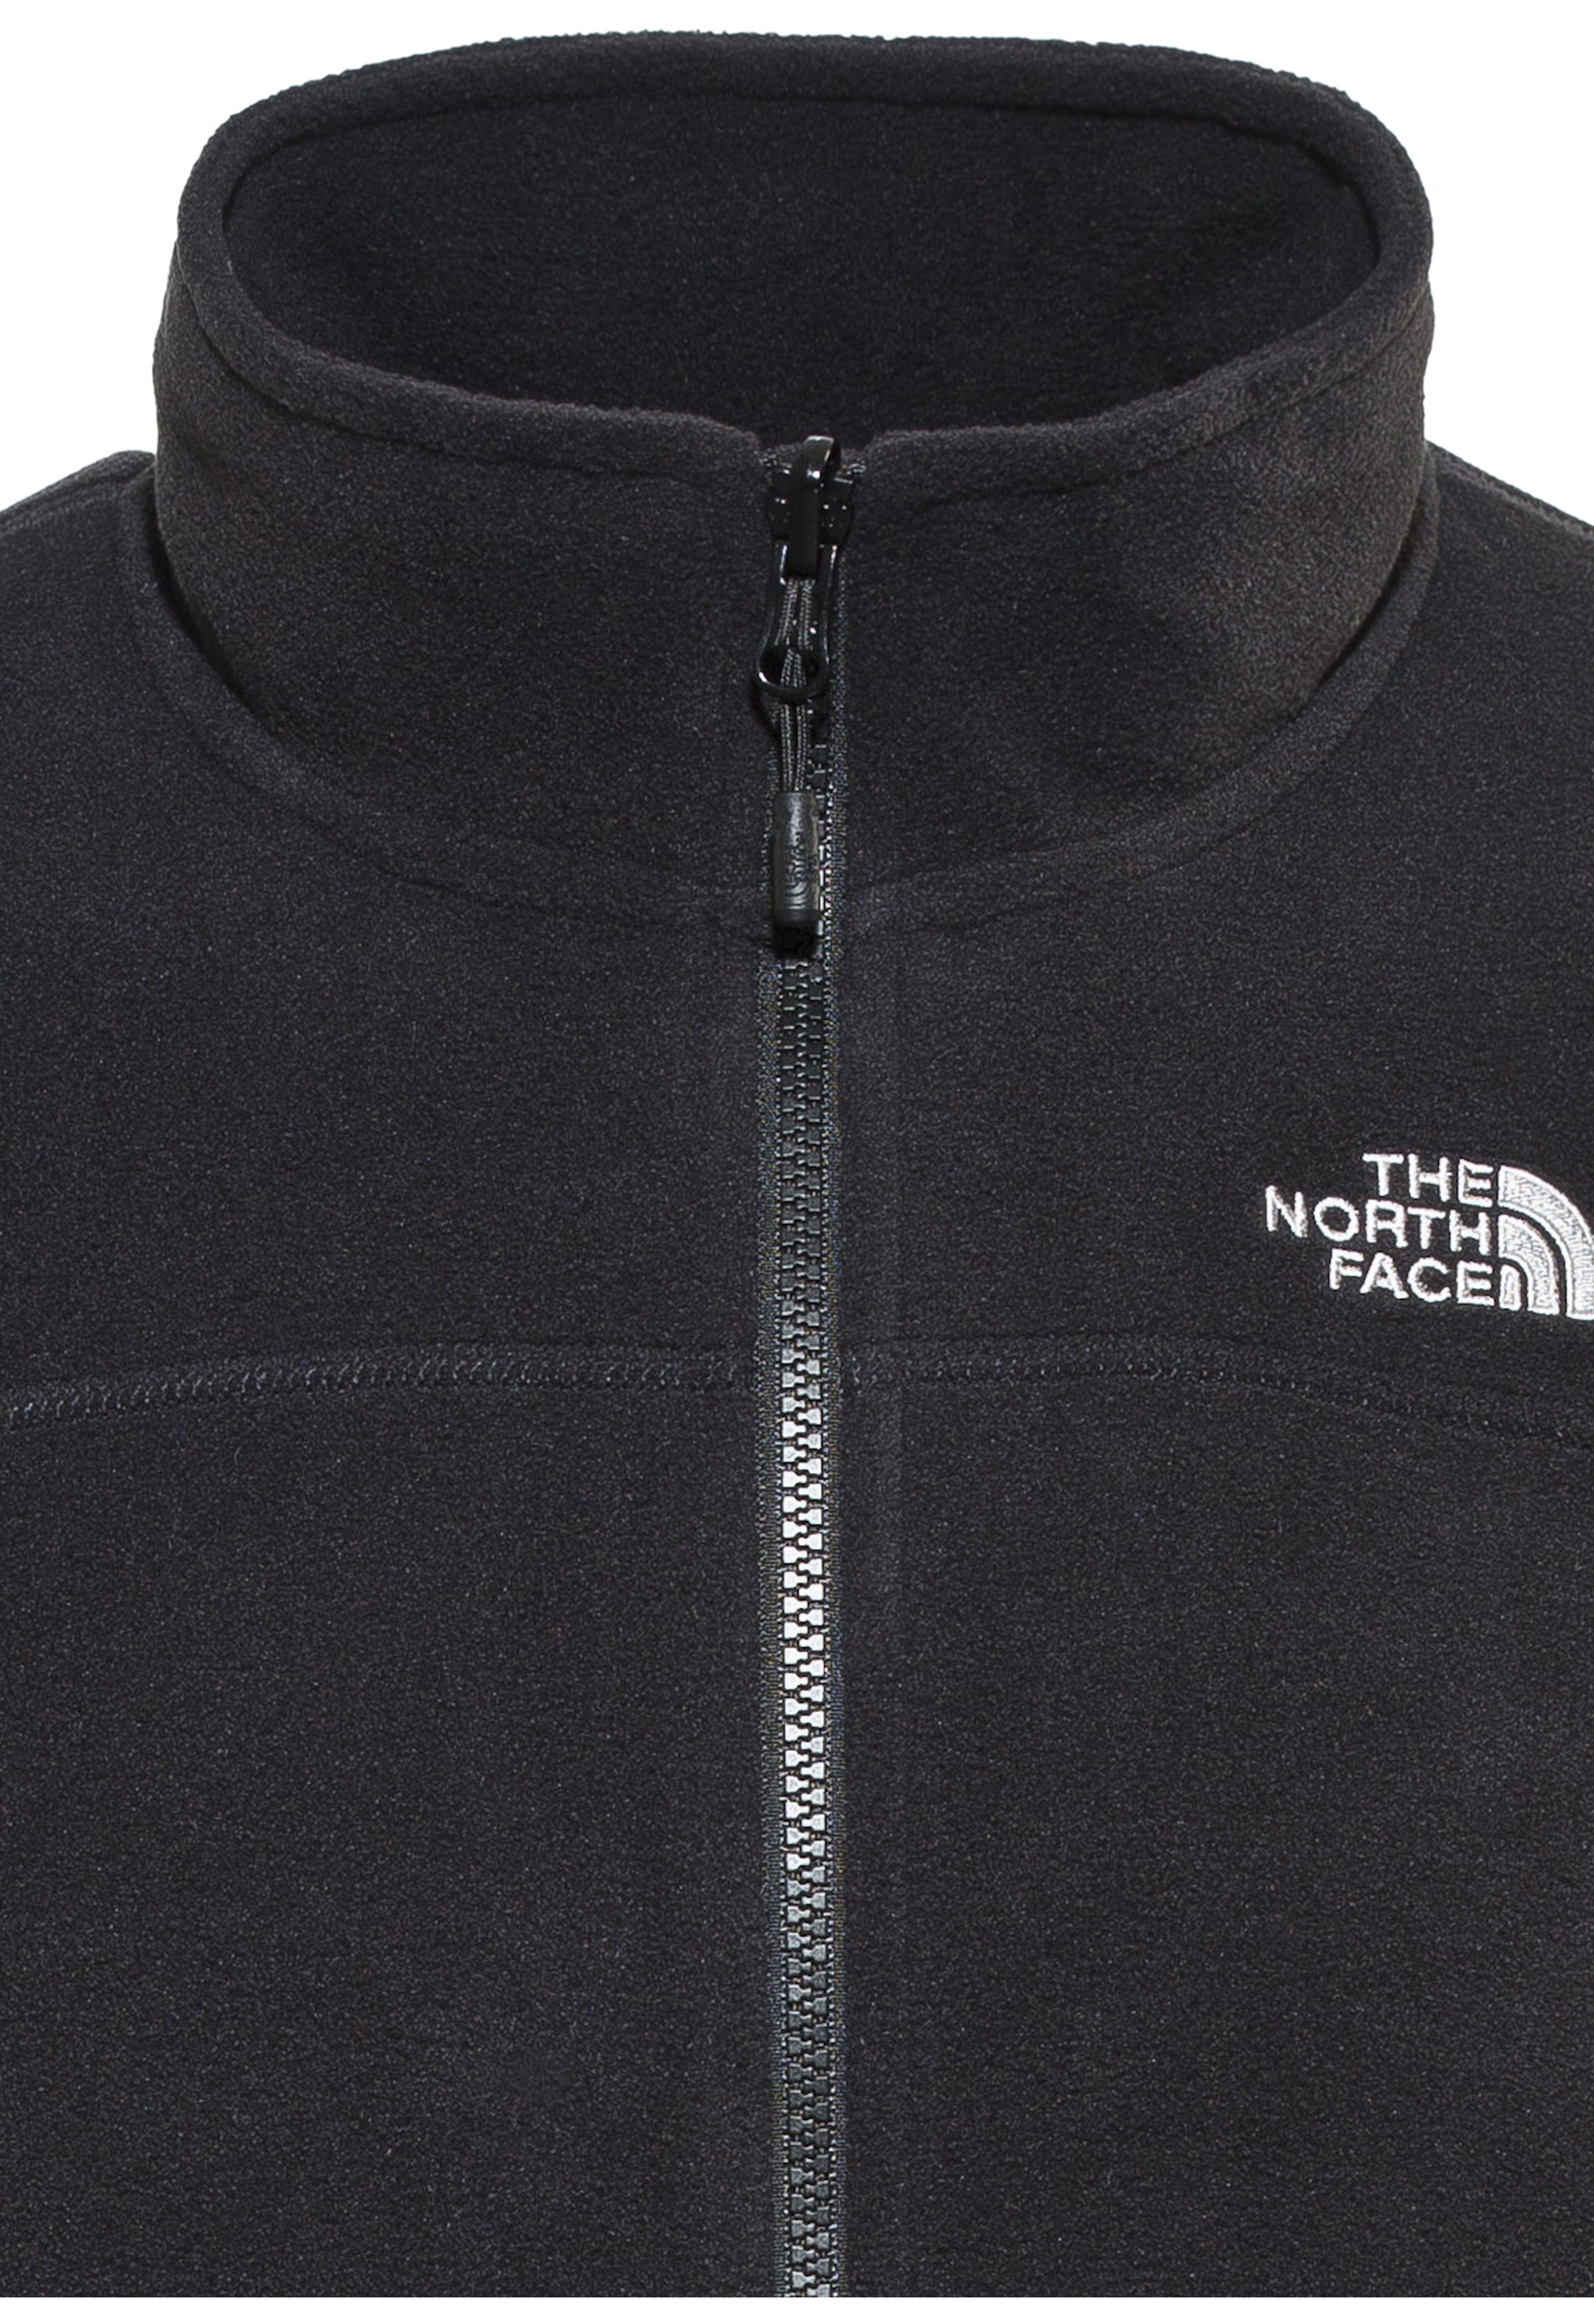 6bd99acb64 The North Face 100 Glacier Full-Zip Jacket Herren tnf black | campz.de